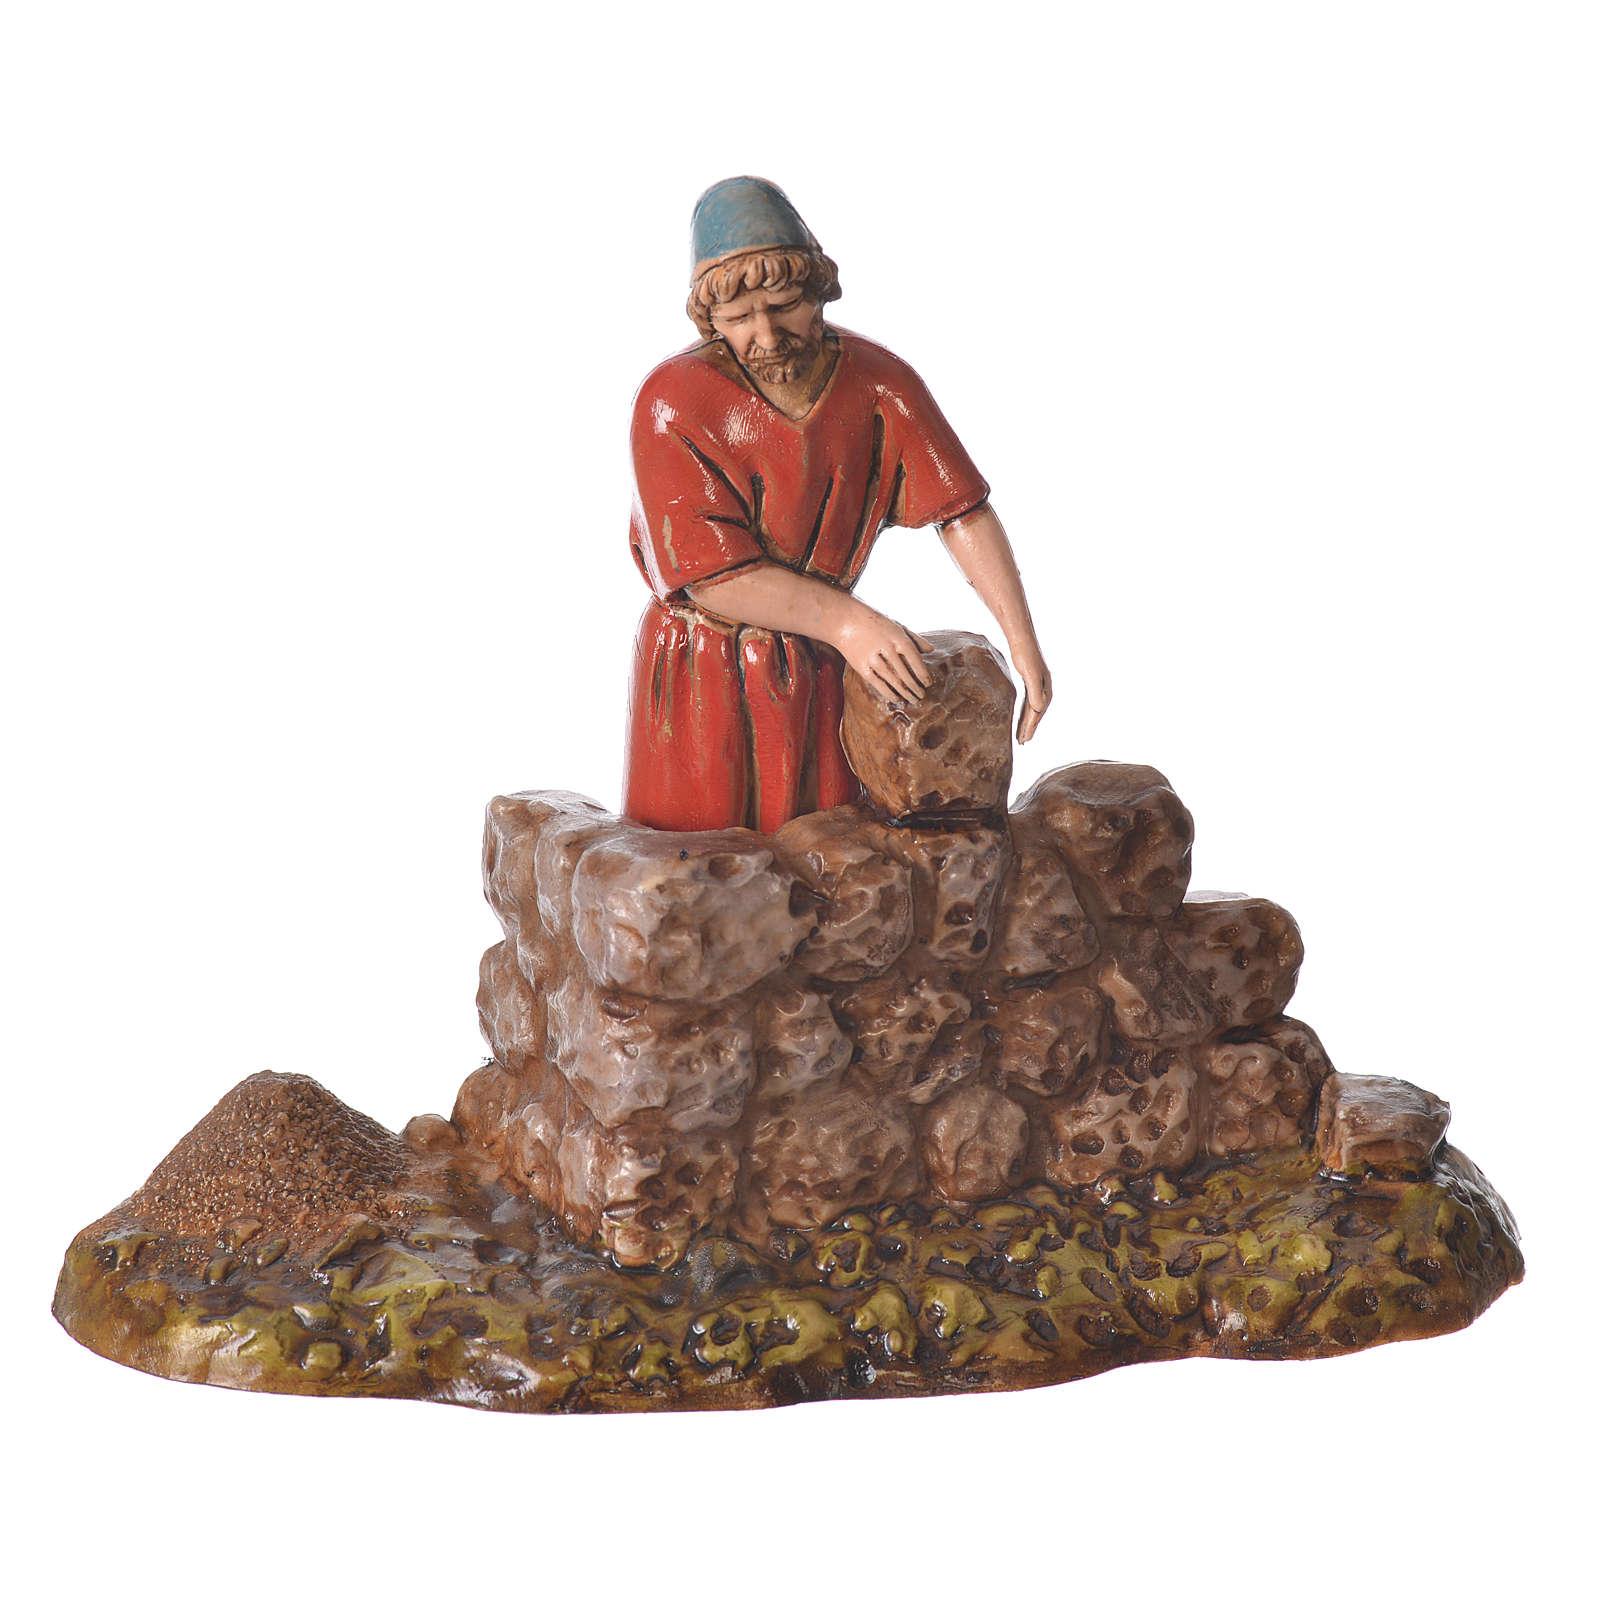 Composition with 4 nativity figurines, 10cm Moranduzzo 4